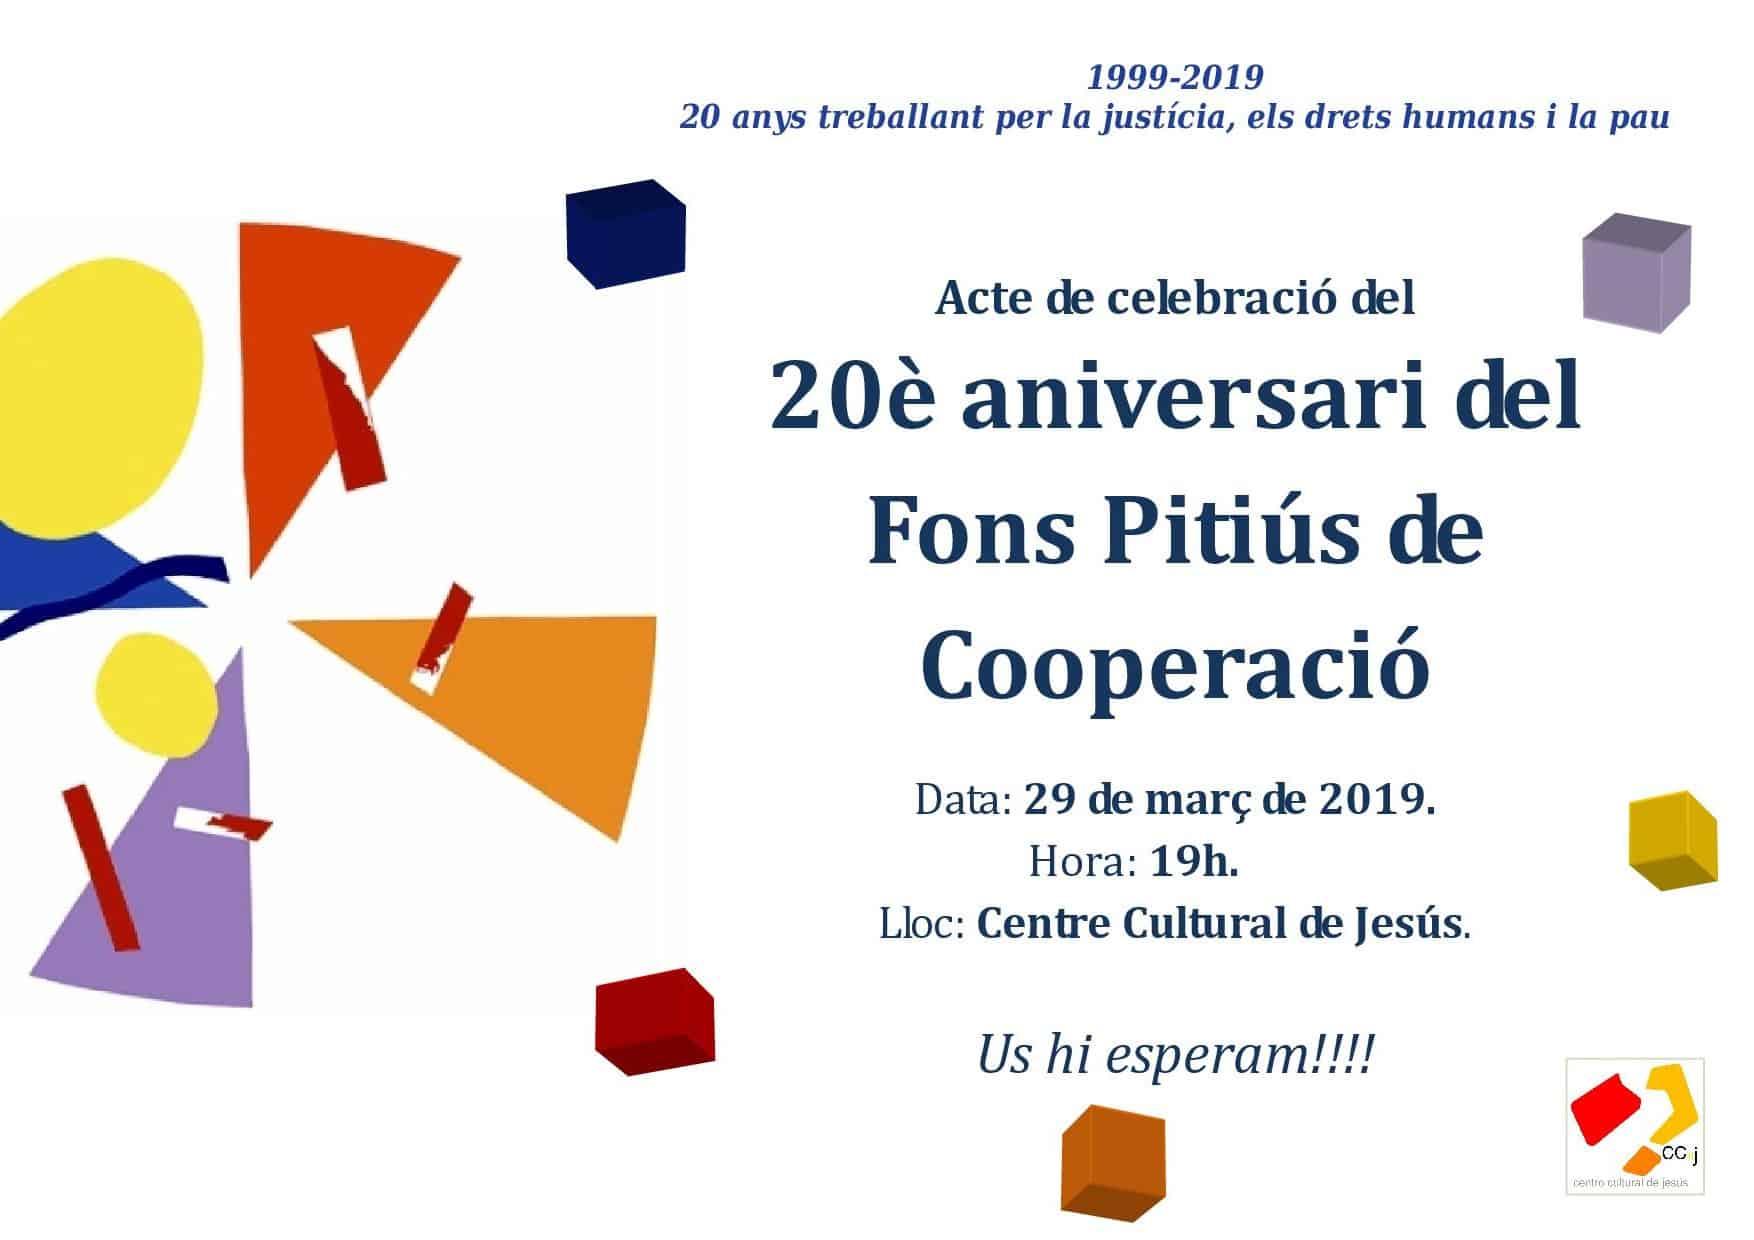 Celebración del 20º aniversario del Fons Pitiús de Cooperació